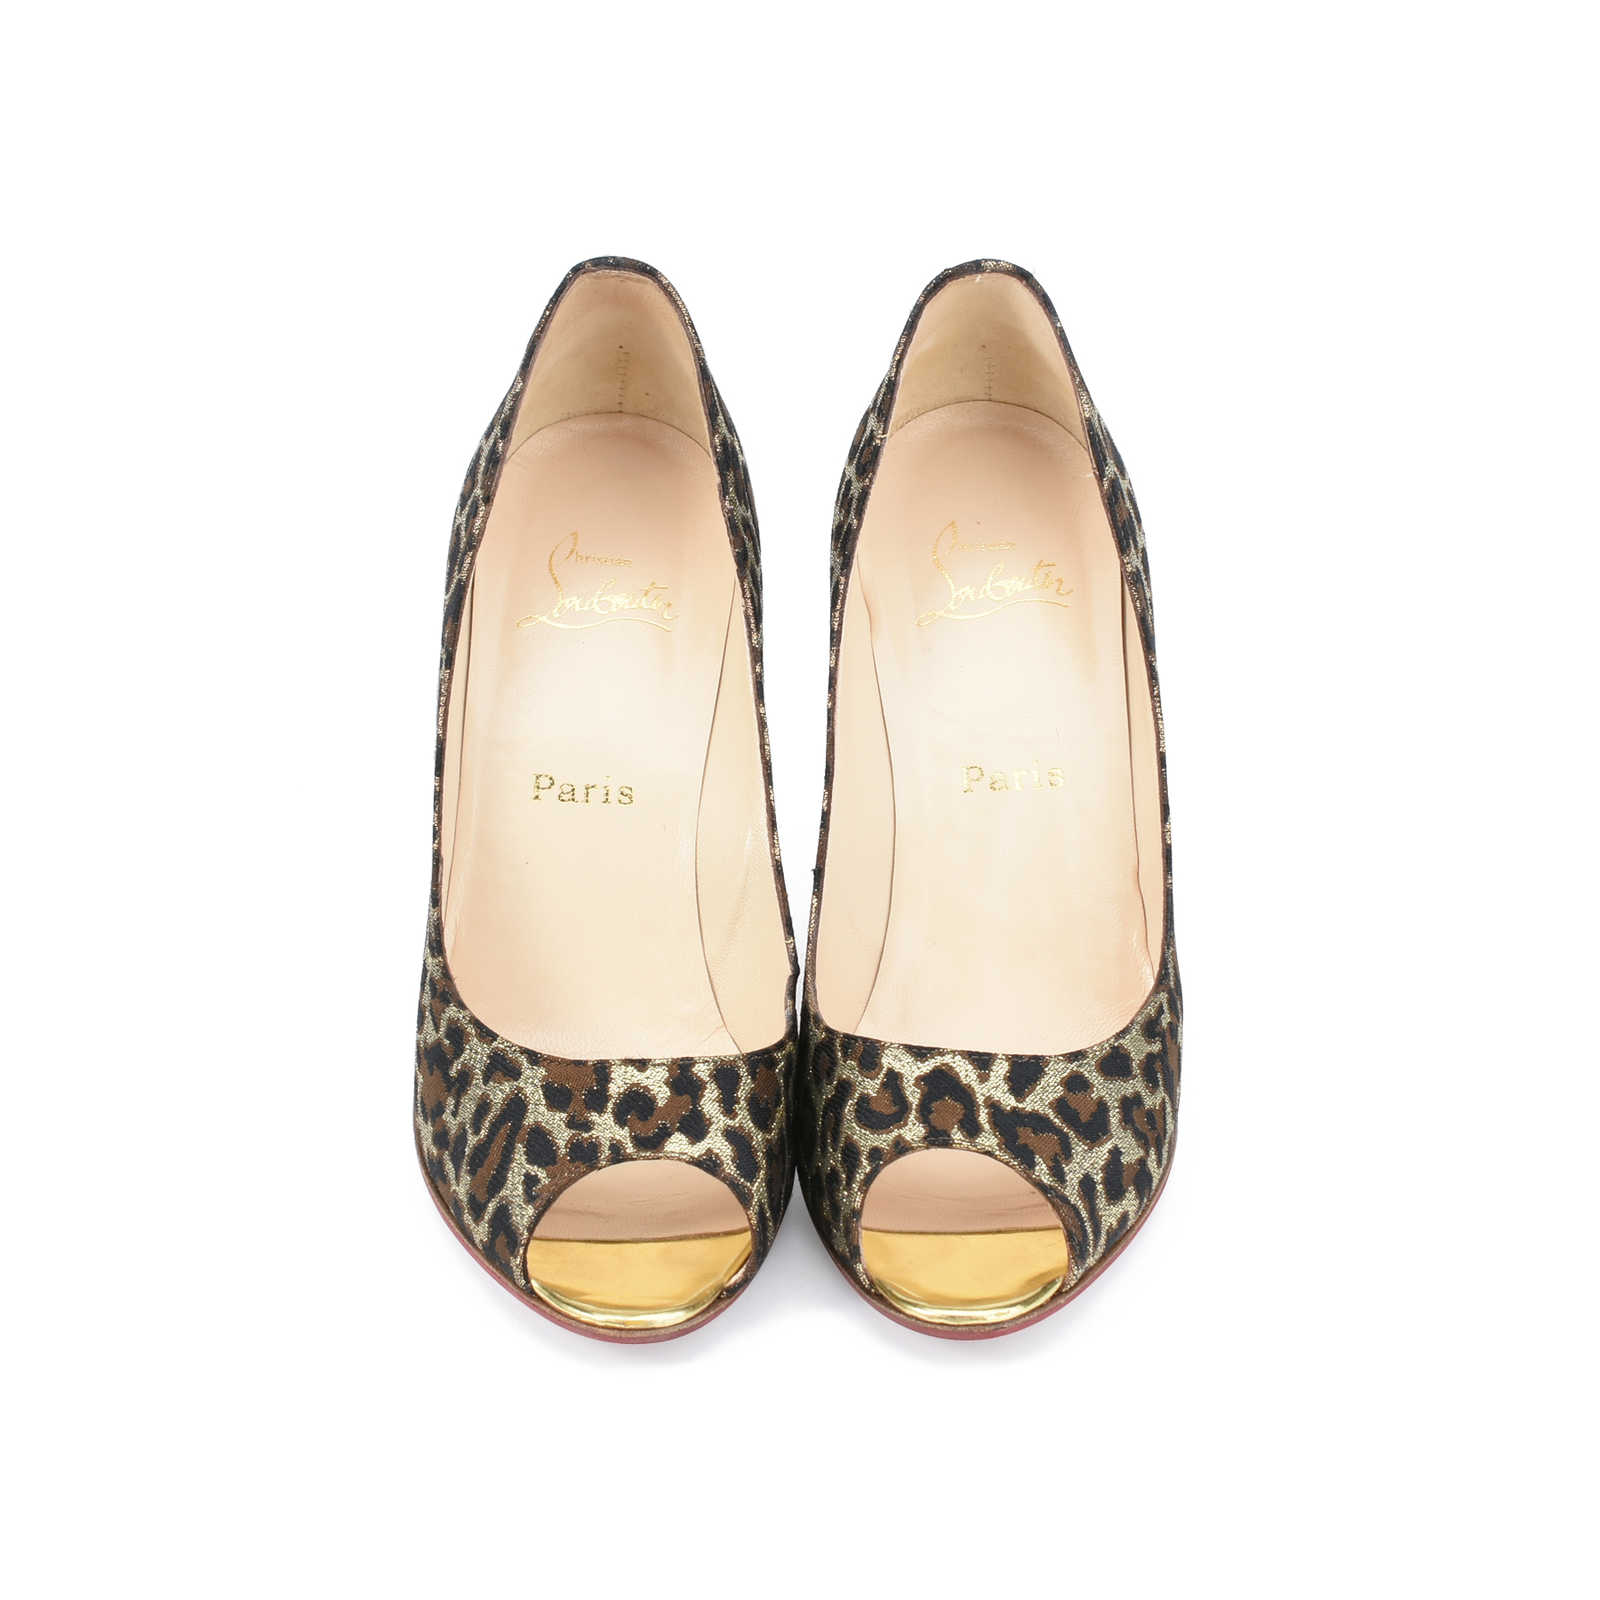 1f71521891e cheap louboutin mary jane jelly shoes 0bf9a d9b2b